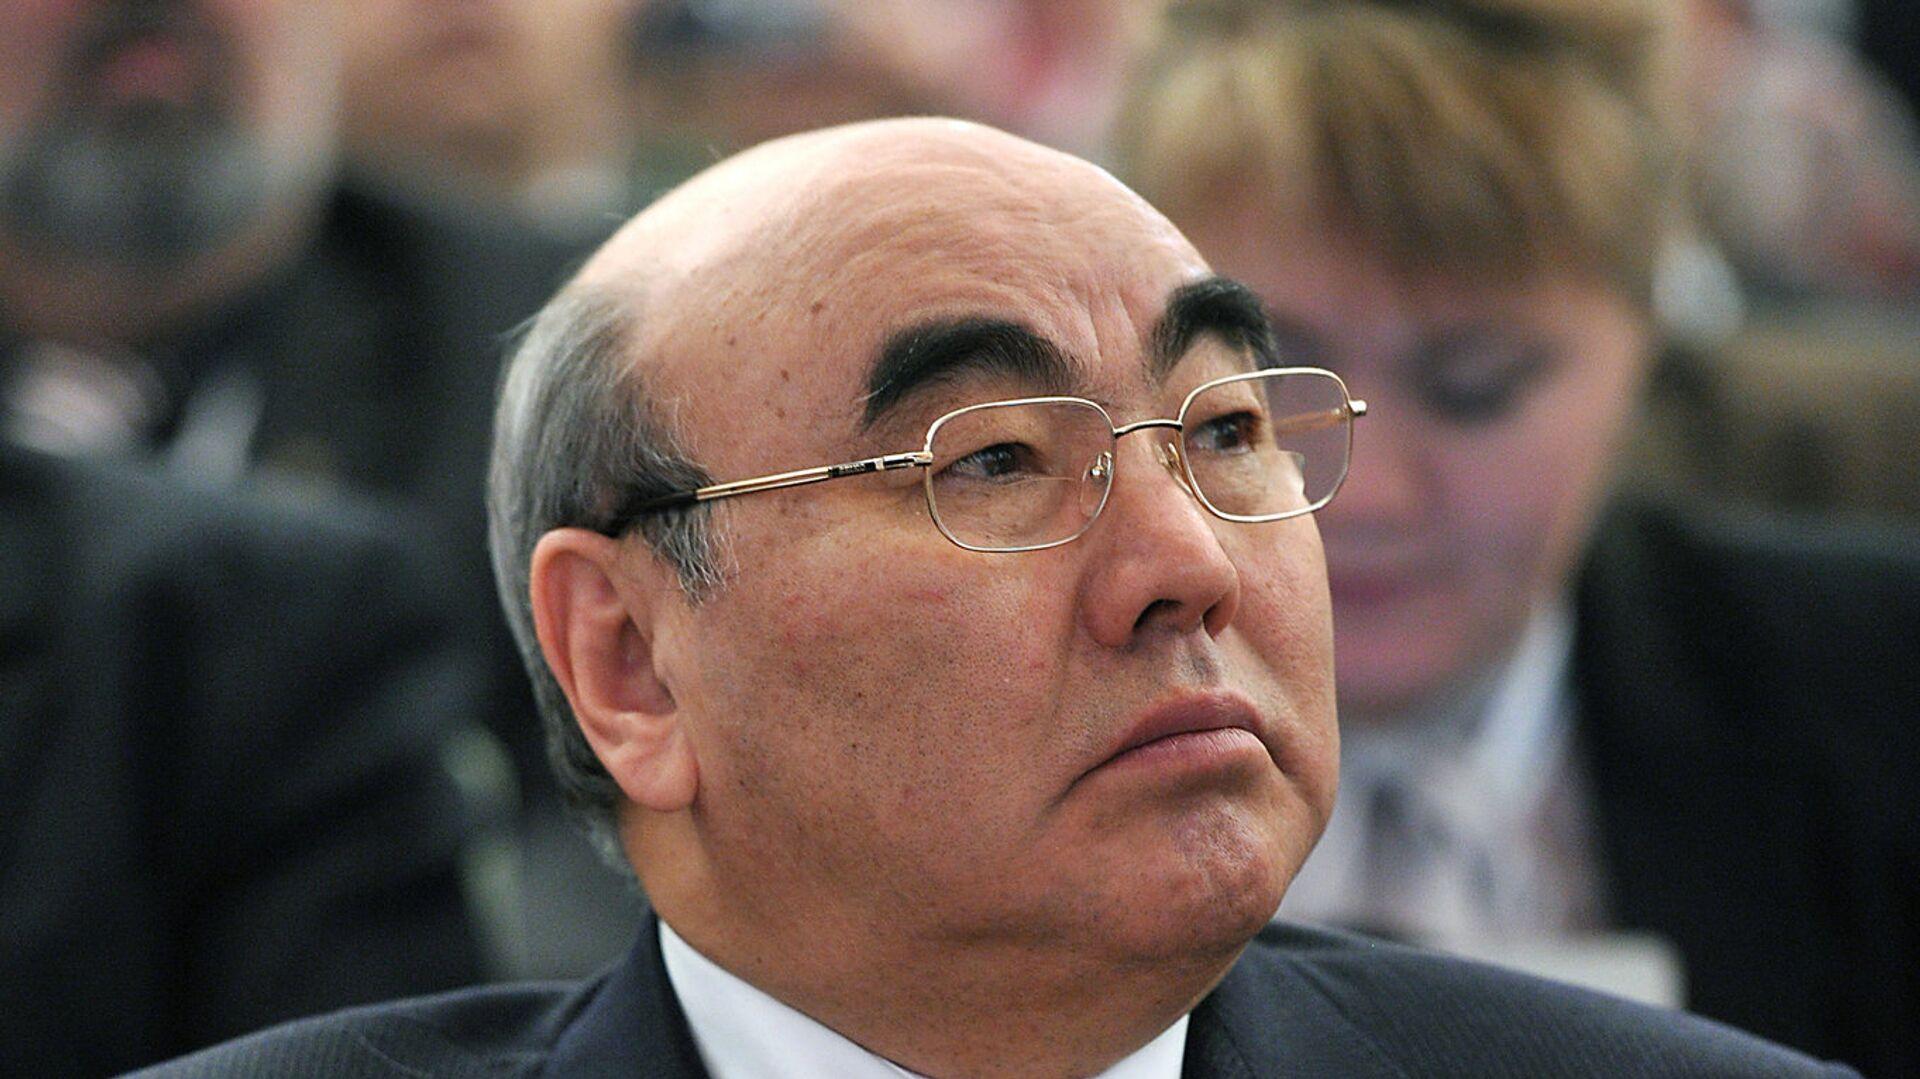 Бывший президент Киргизии Аскар Акаев - РИА Новости, 1920, 02.08.2021